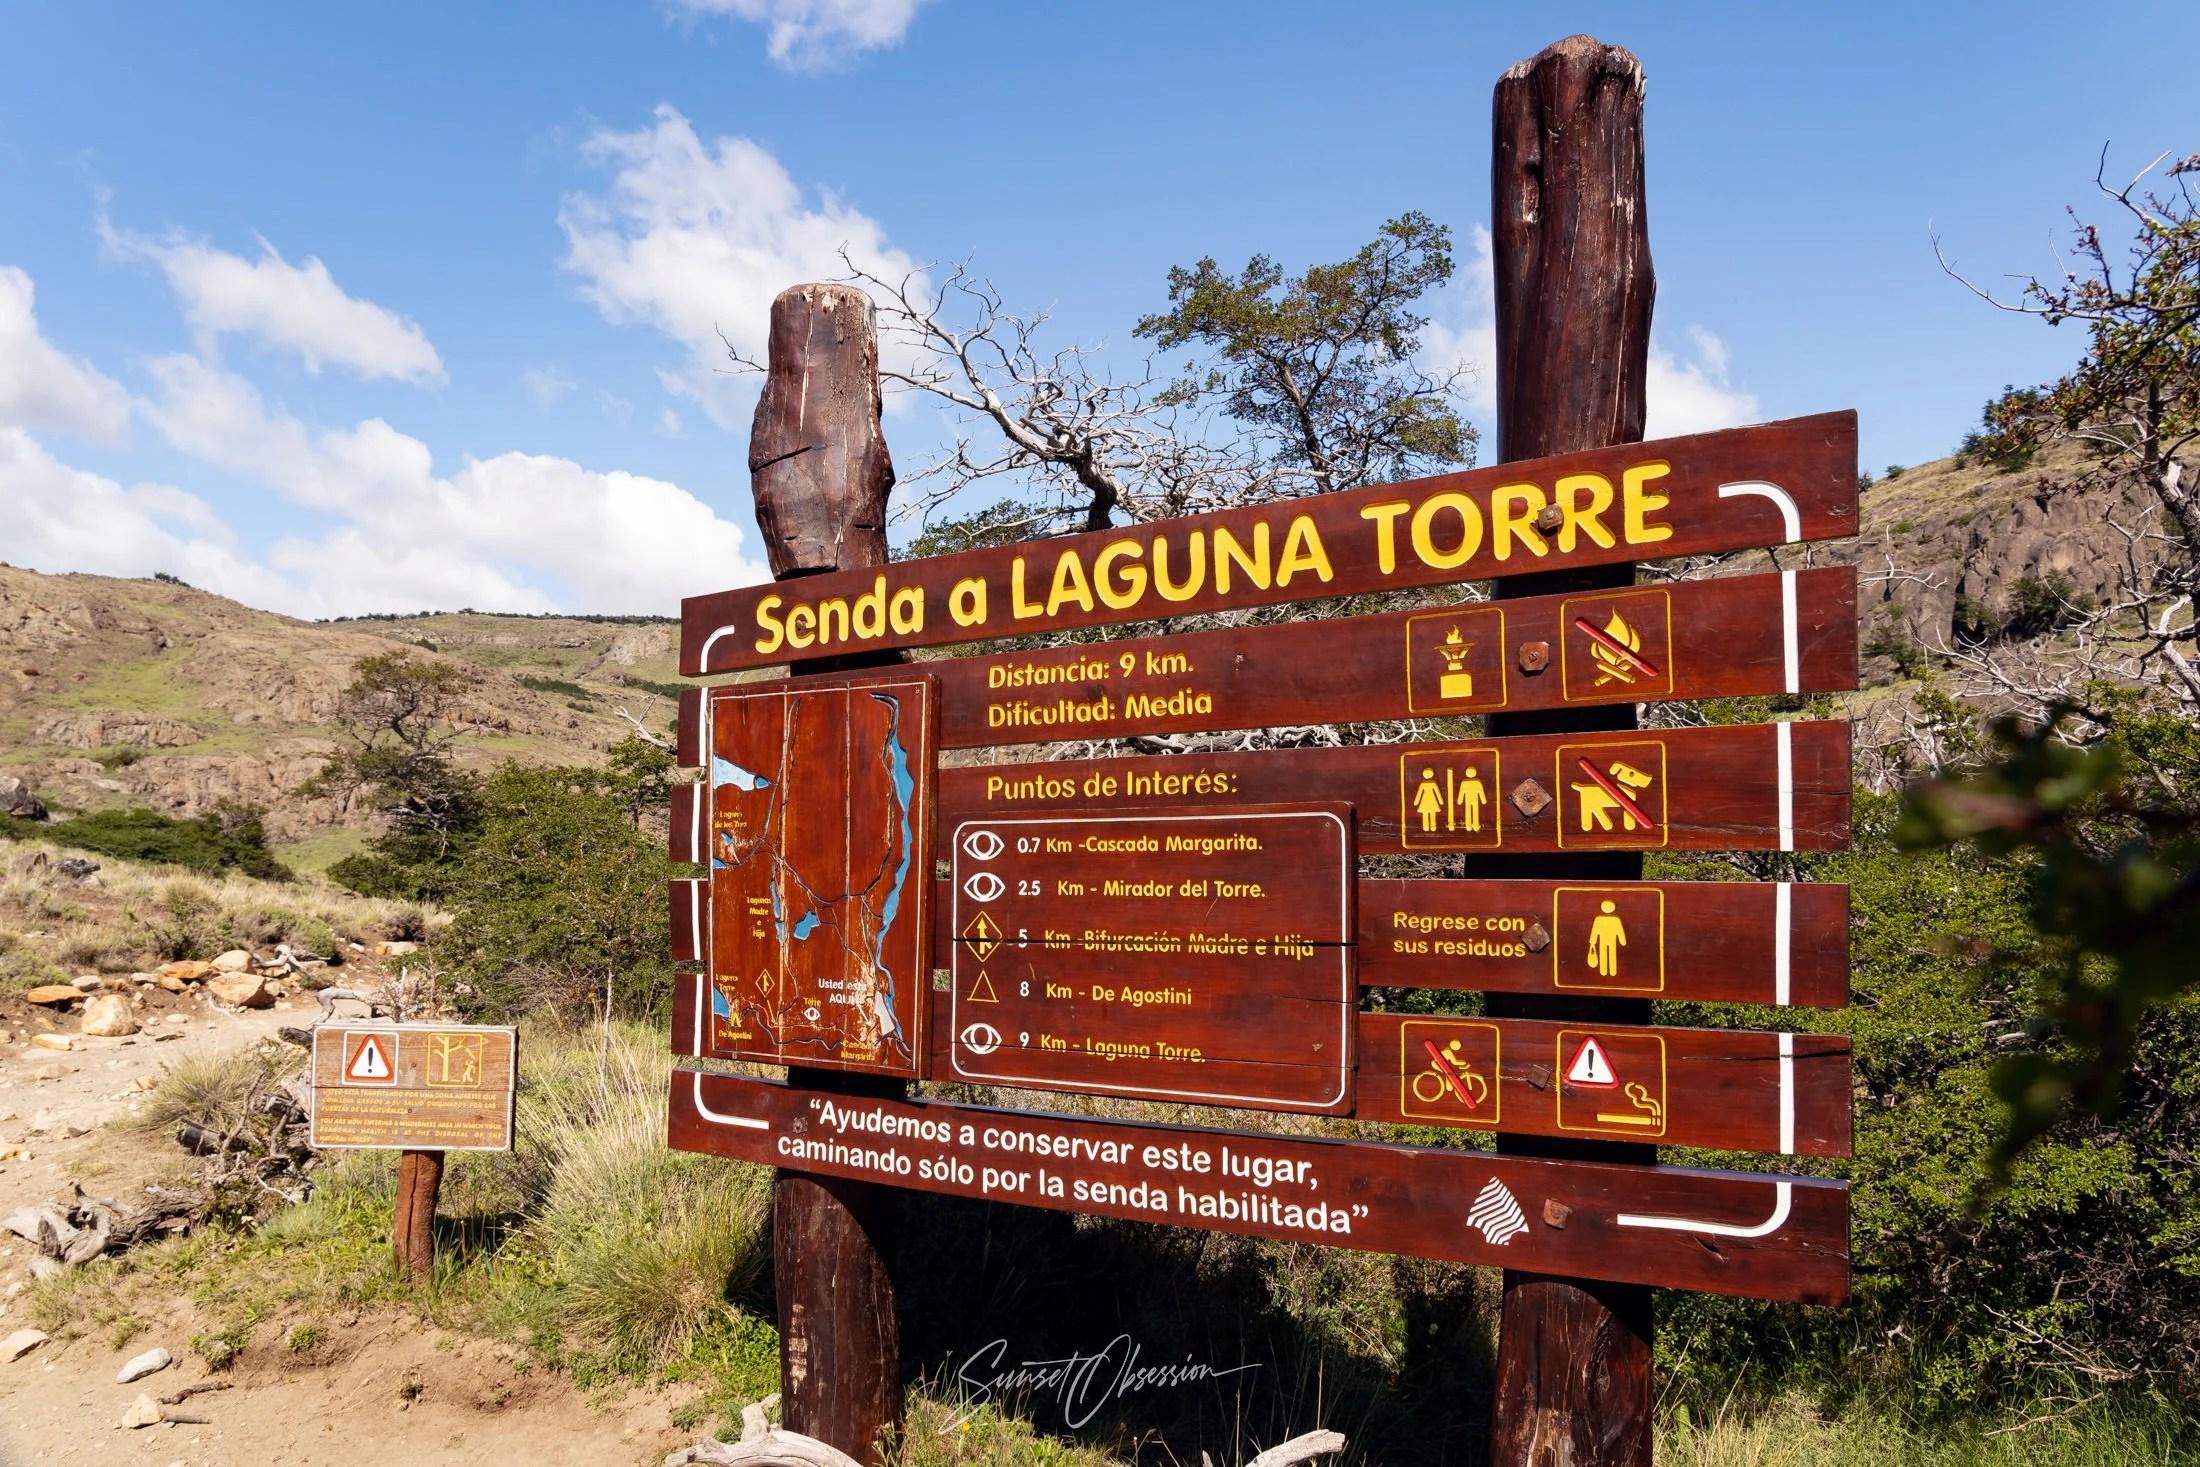 Start of the hike to Laguna Torre